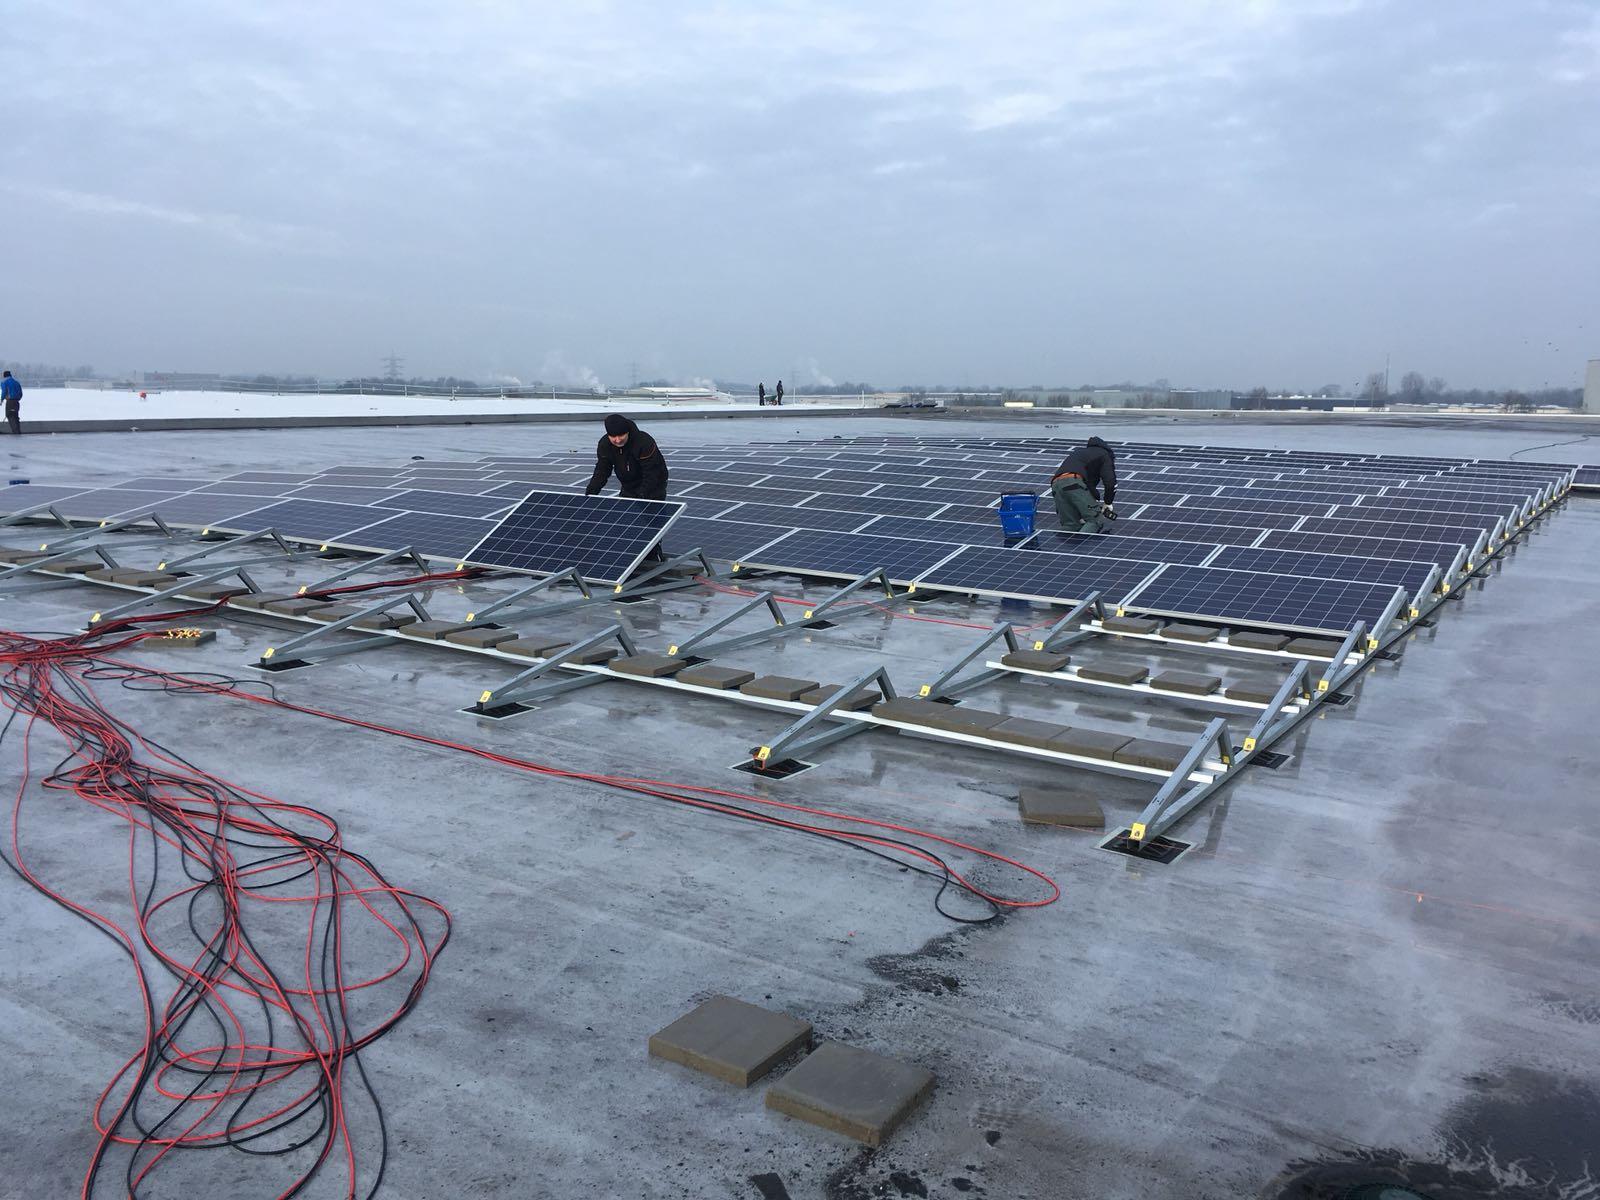 Thumbnail Plaatsing zonnepanelen nieuwbouw